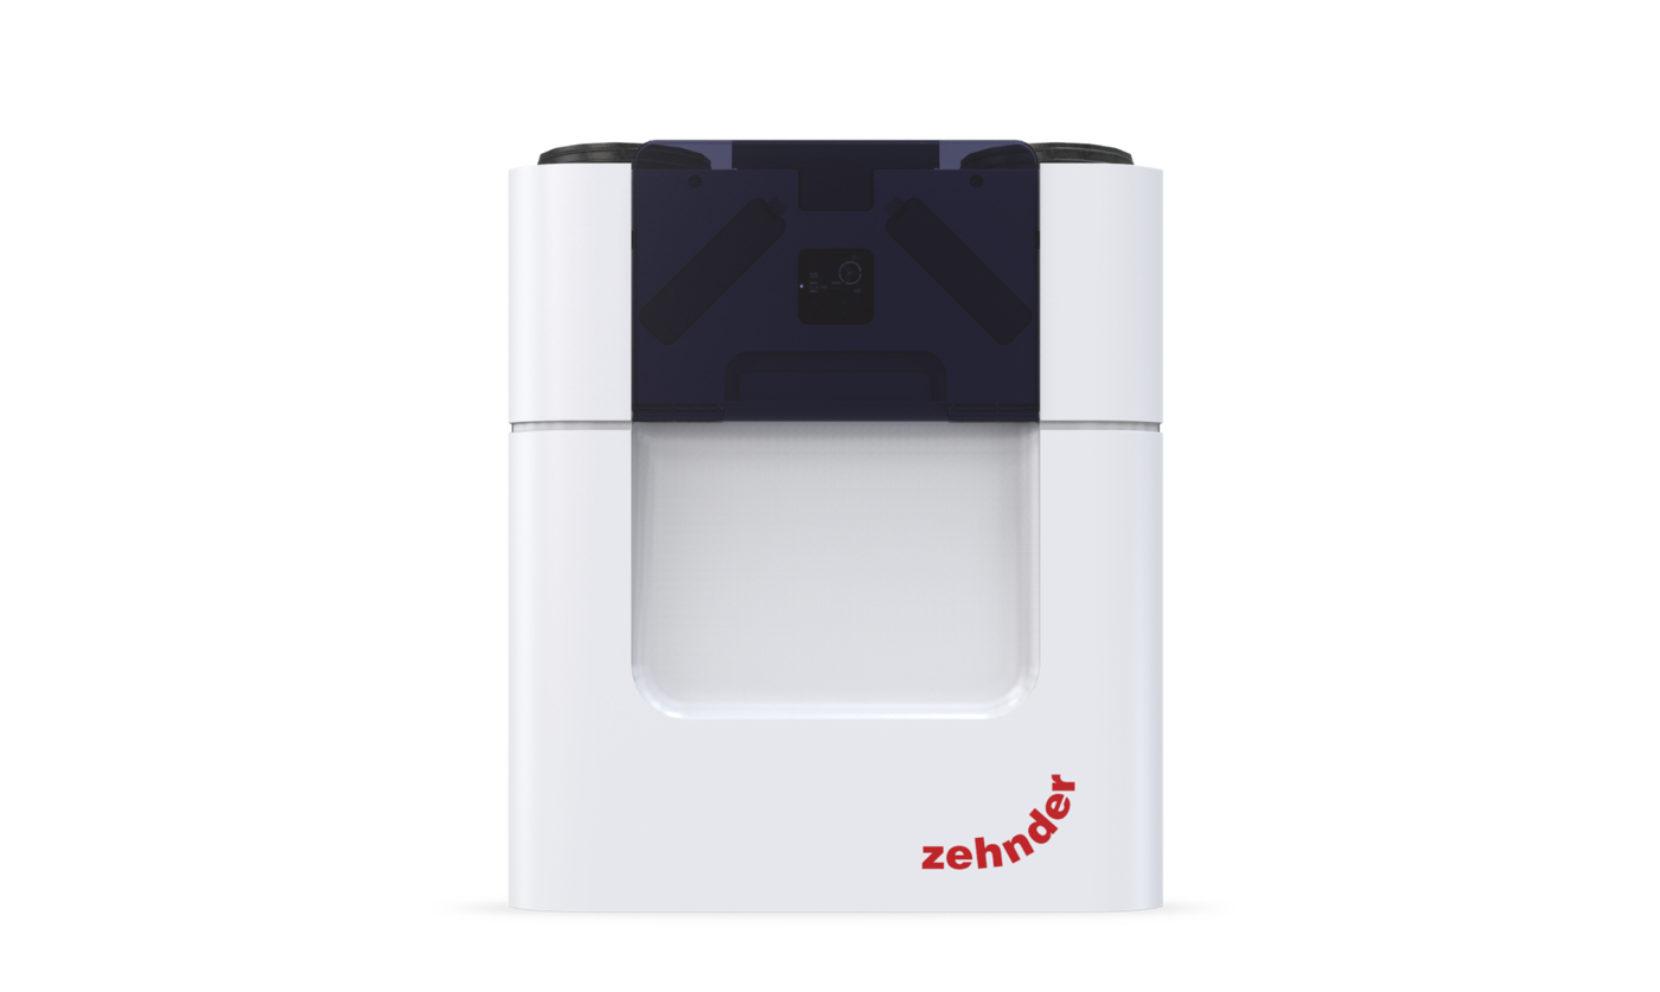 Zehnder case 2 x2